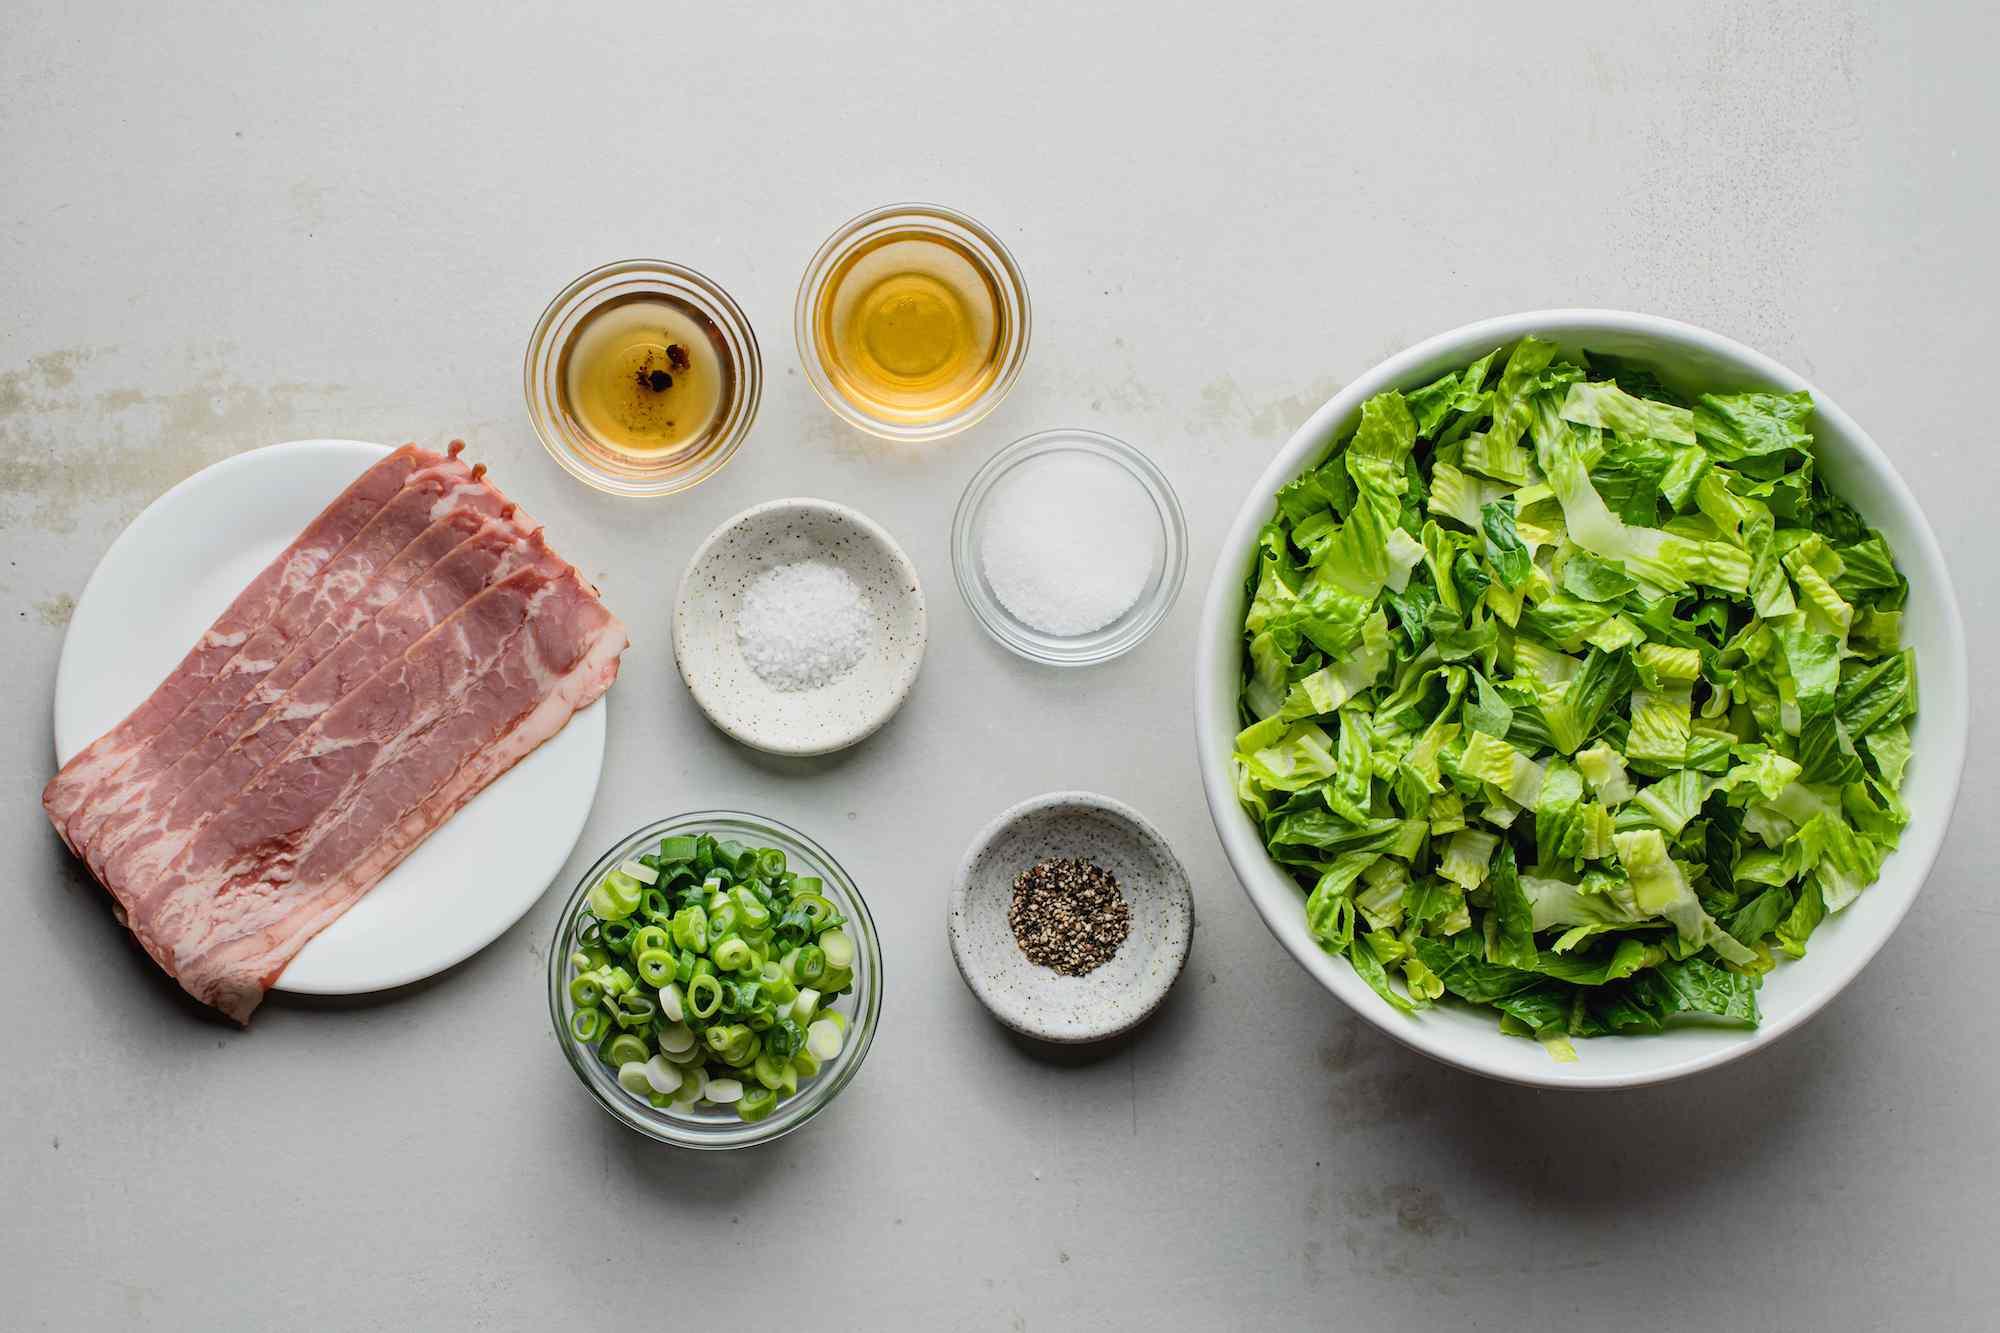 Ingredients for wilted lettuce salad